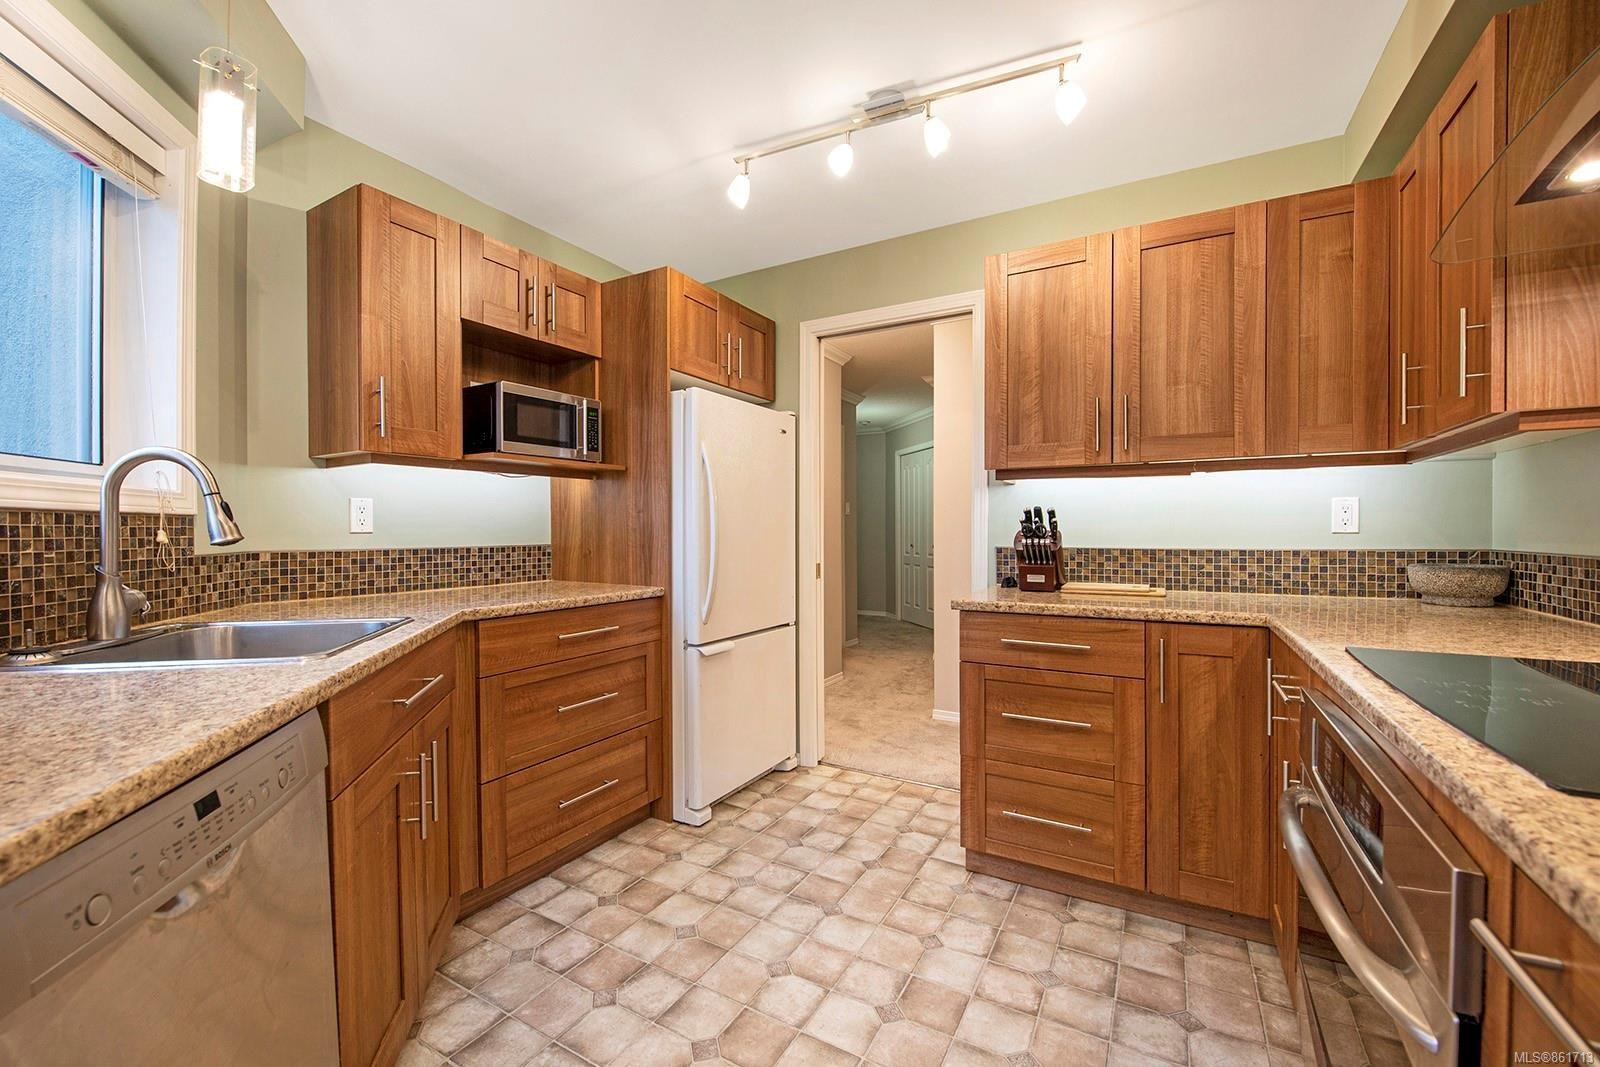 Main Photo: 222 4693 Muir Rd in : CV Courtenay East Condo for sale (Comox Valley)  : MLS®# 861713